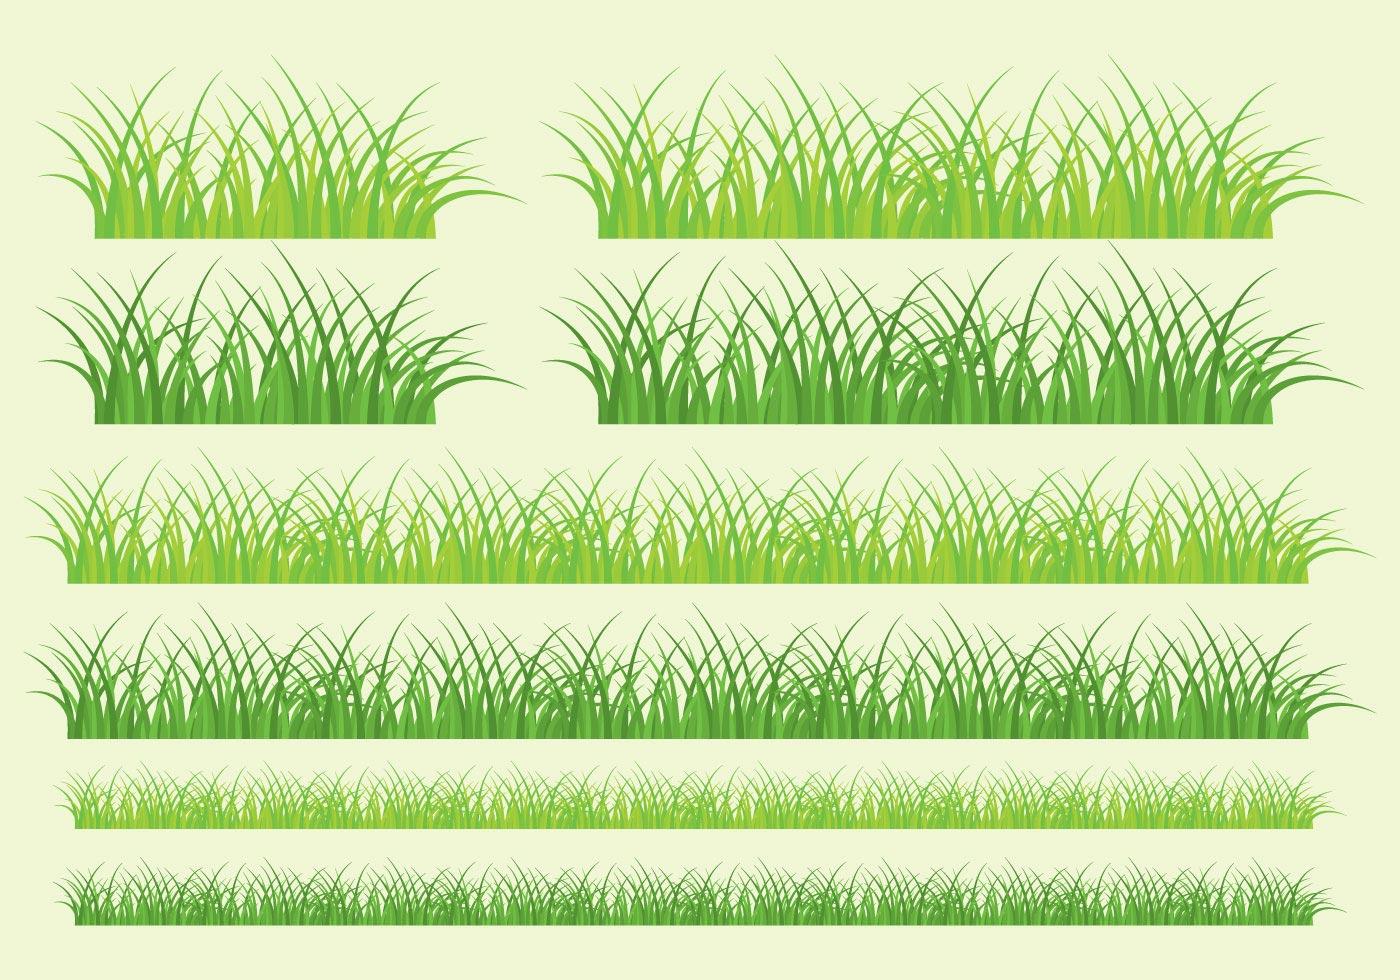 grass free vector art 21023 free downloads rh vecteezy com free vector grass background free vector grass silhouette